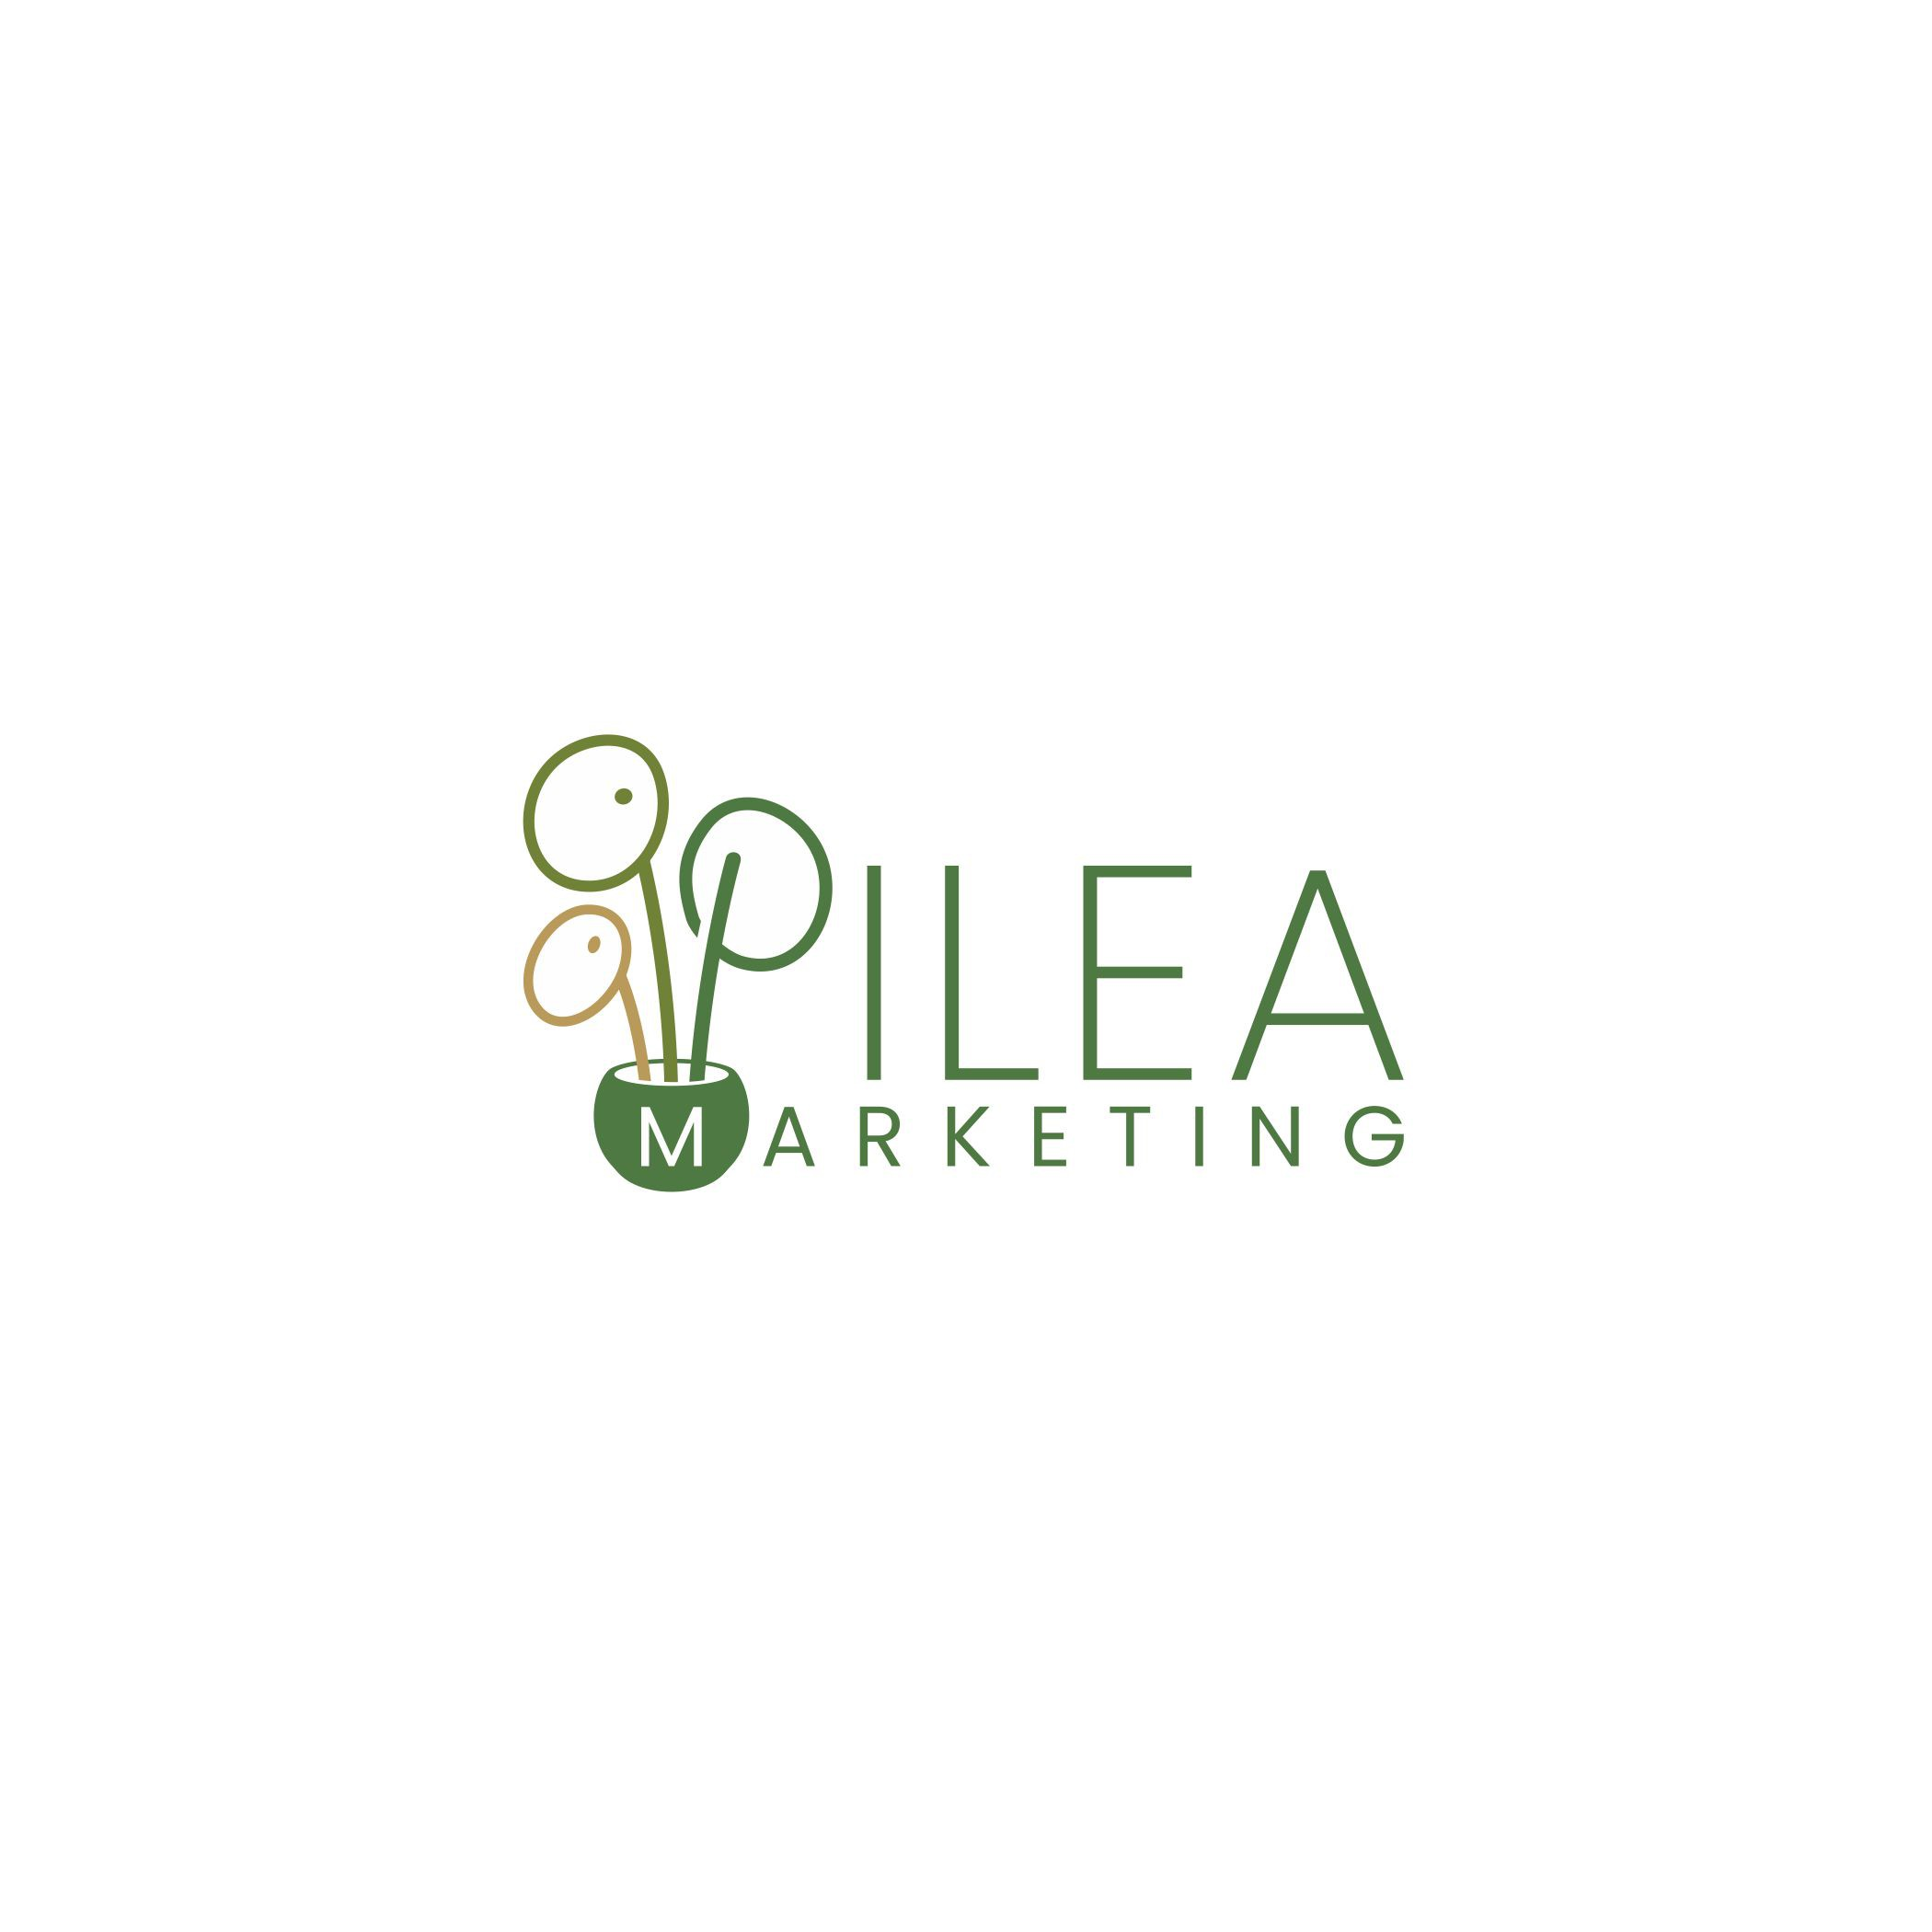 Pilea, Pancake, UFO: Use this plant for my marketing logo!